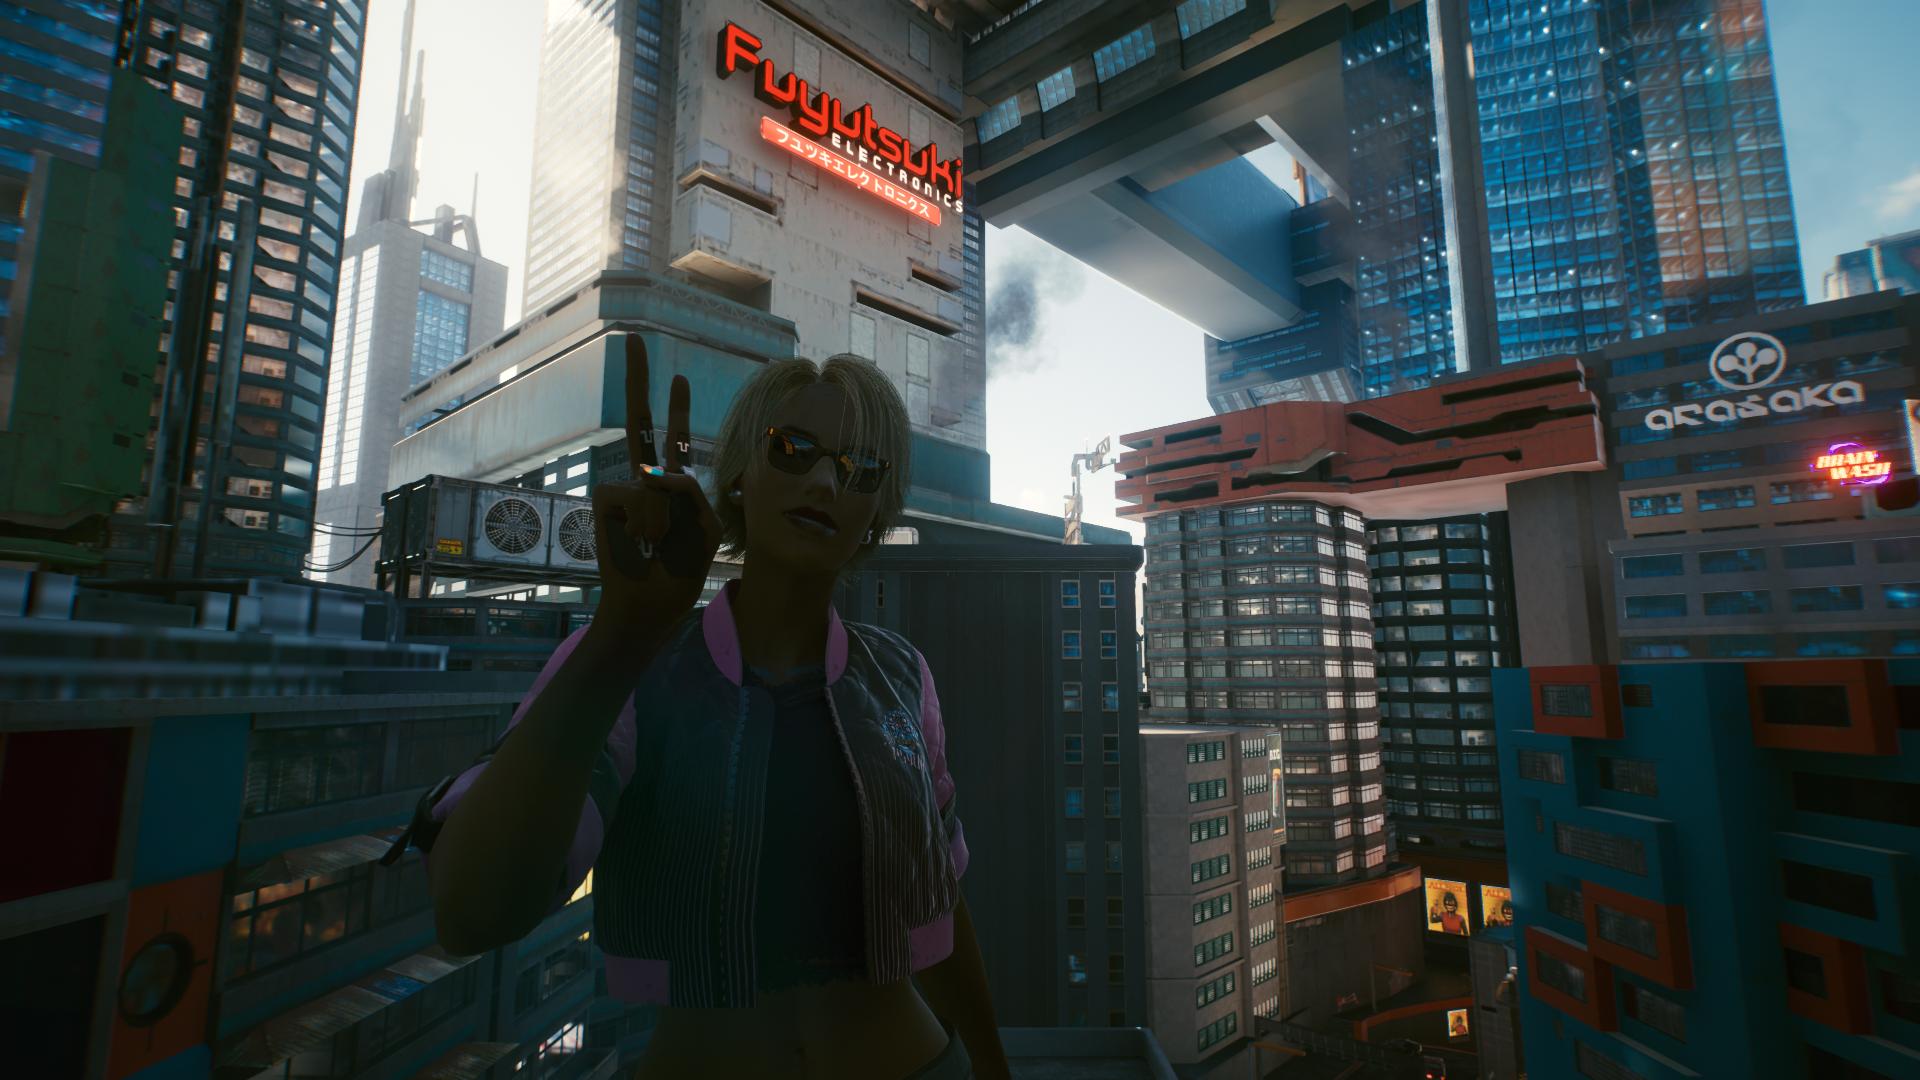 Город мечты - Cyberpunk 2077